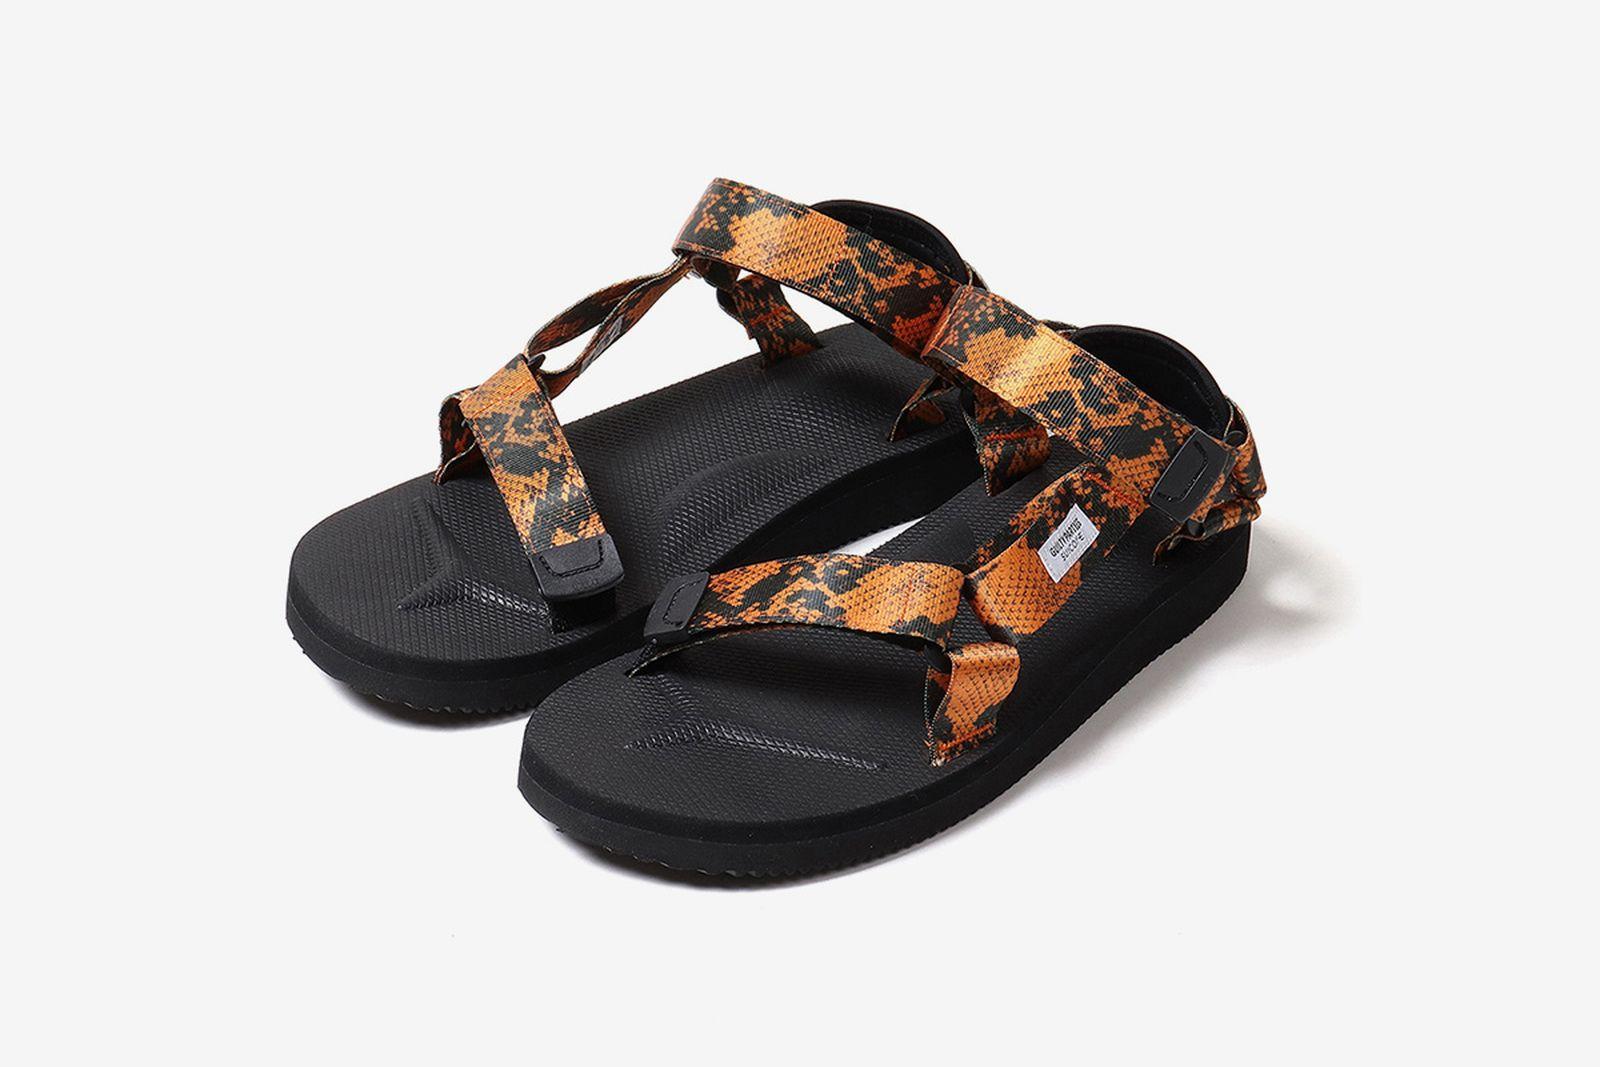 wacko-maria-suicoke-sandals-release-date-price-01